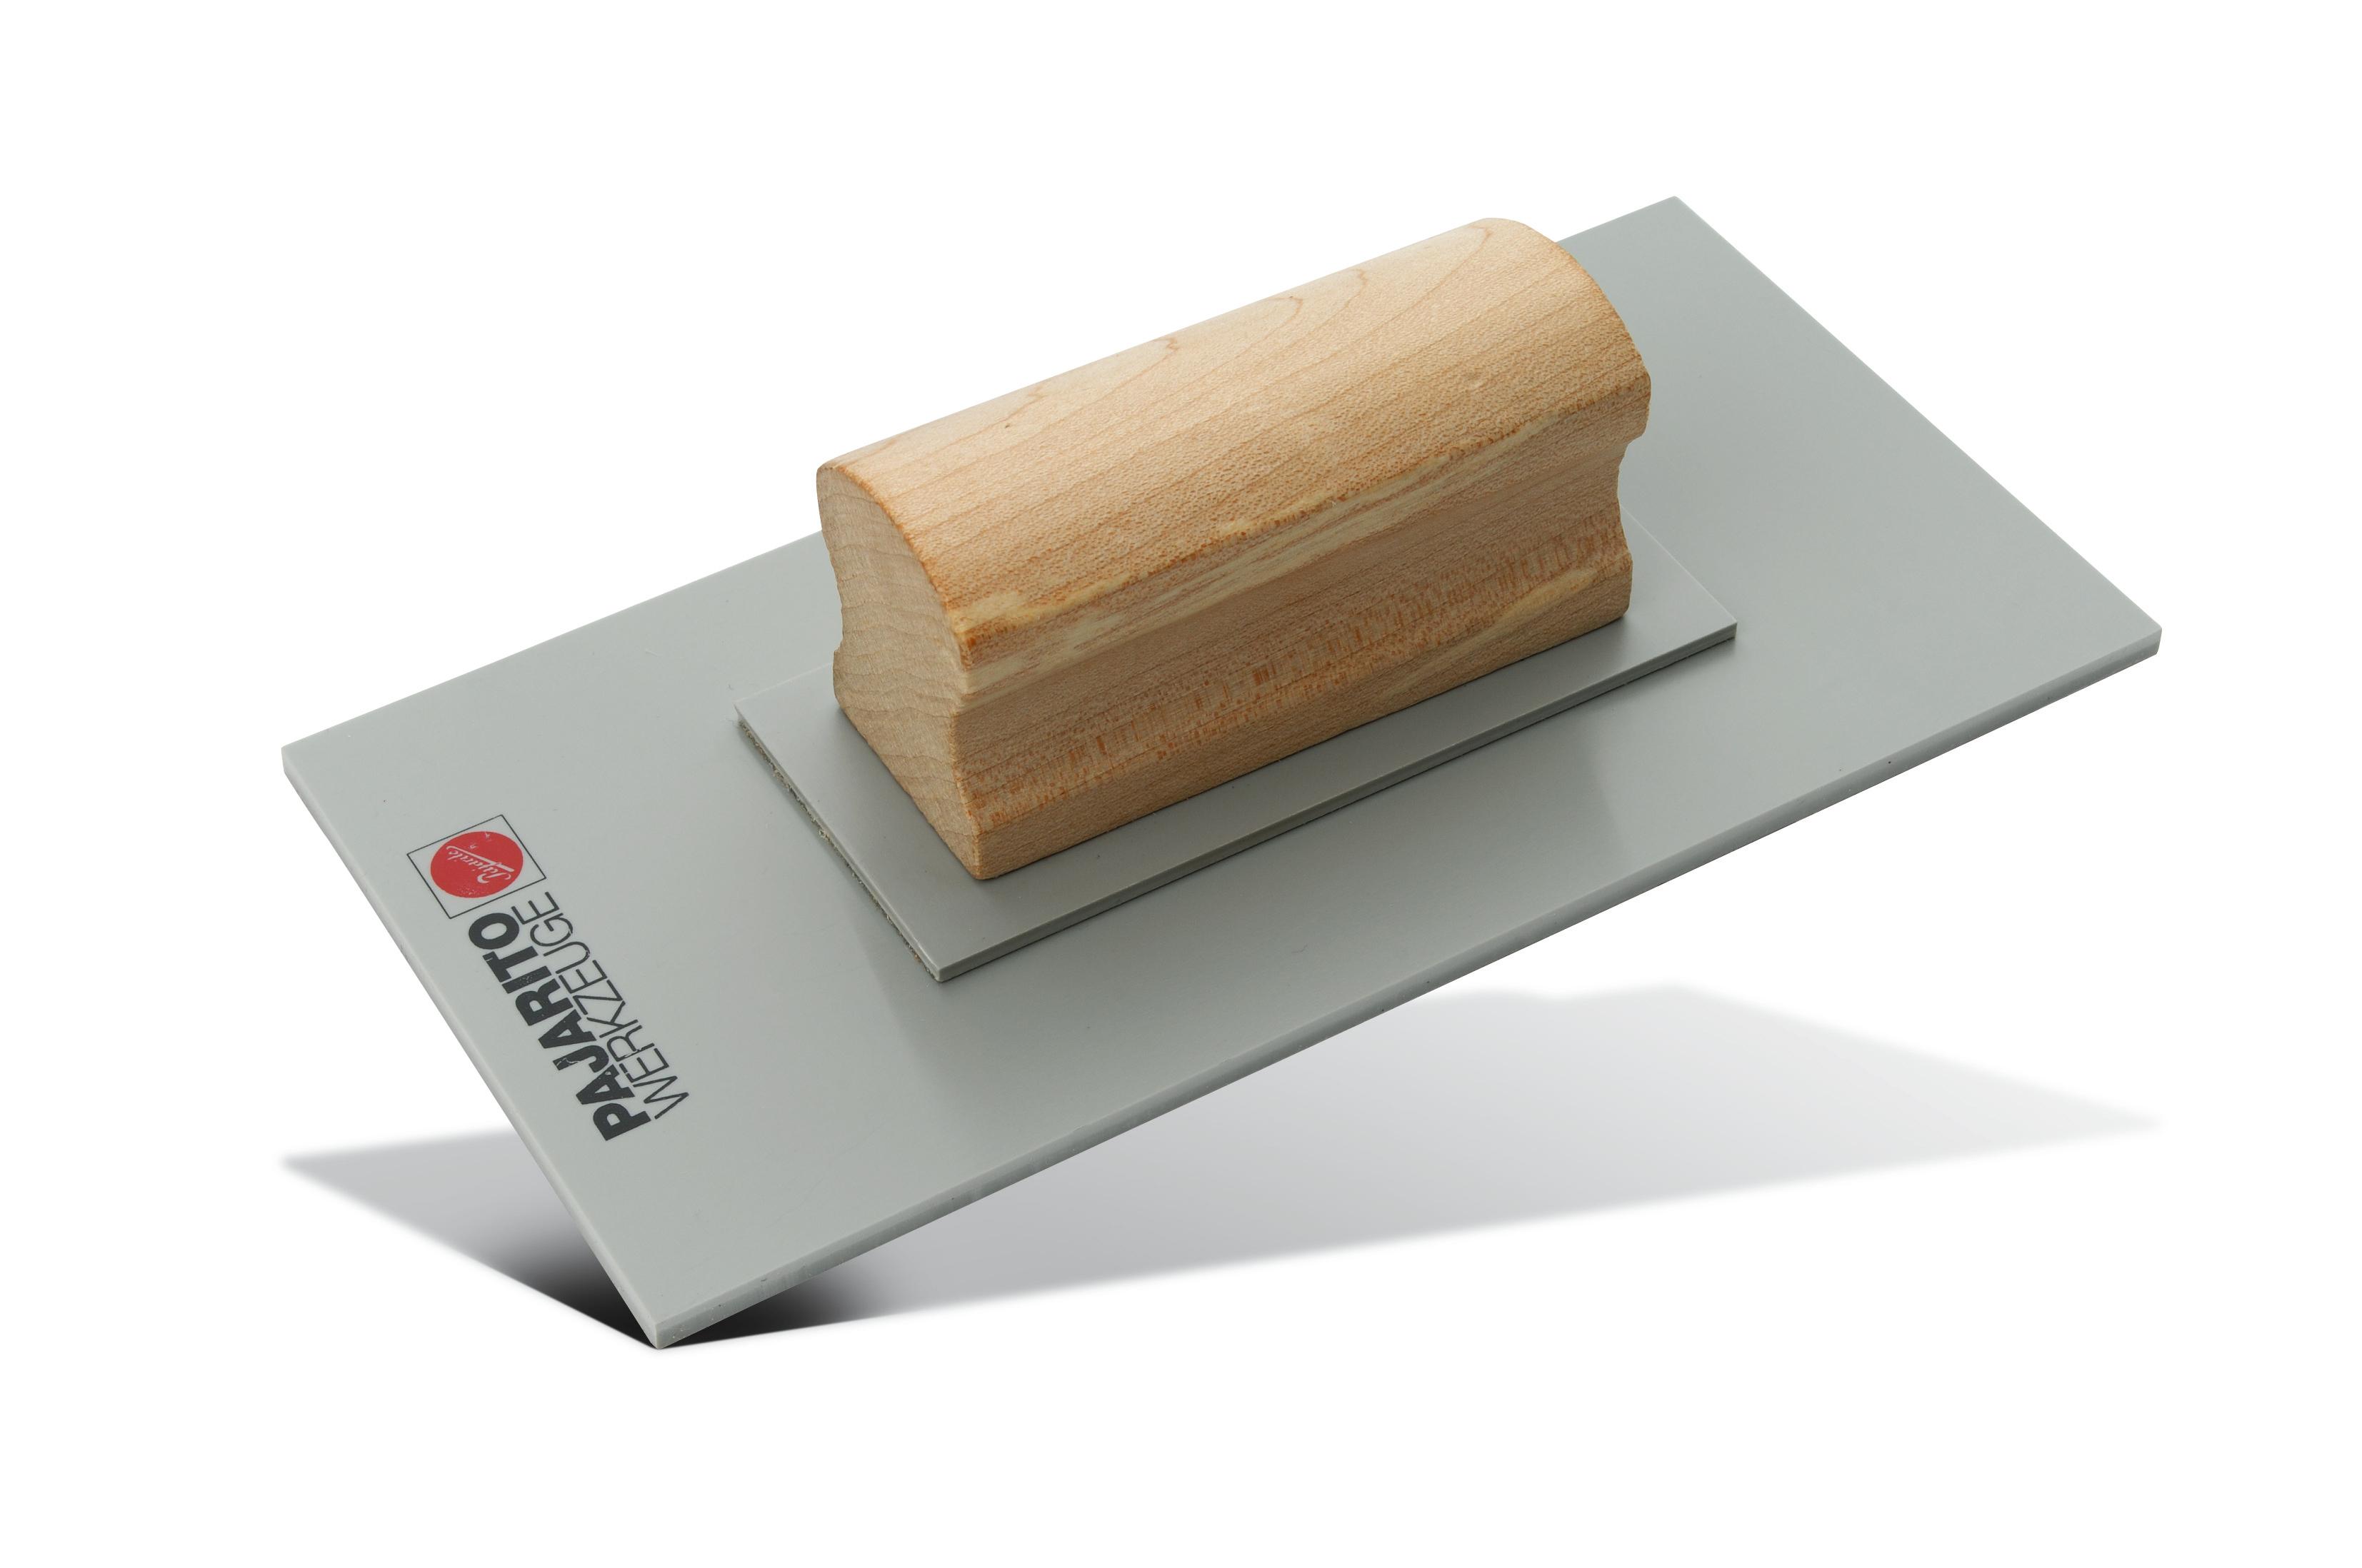 Mini gladilica za zaglađivanje 160x80x0,3 mm, PAJARITO